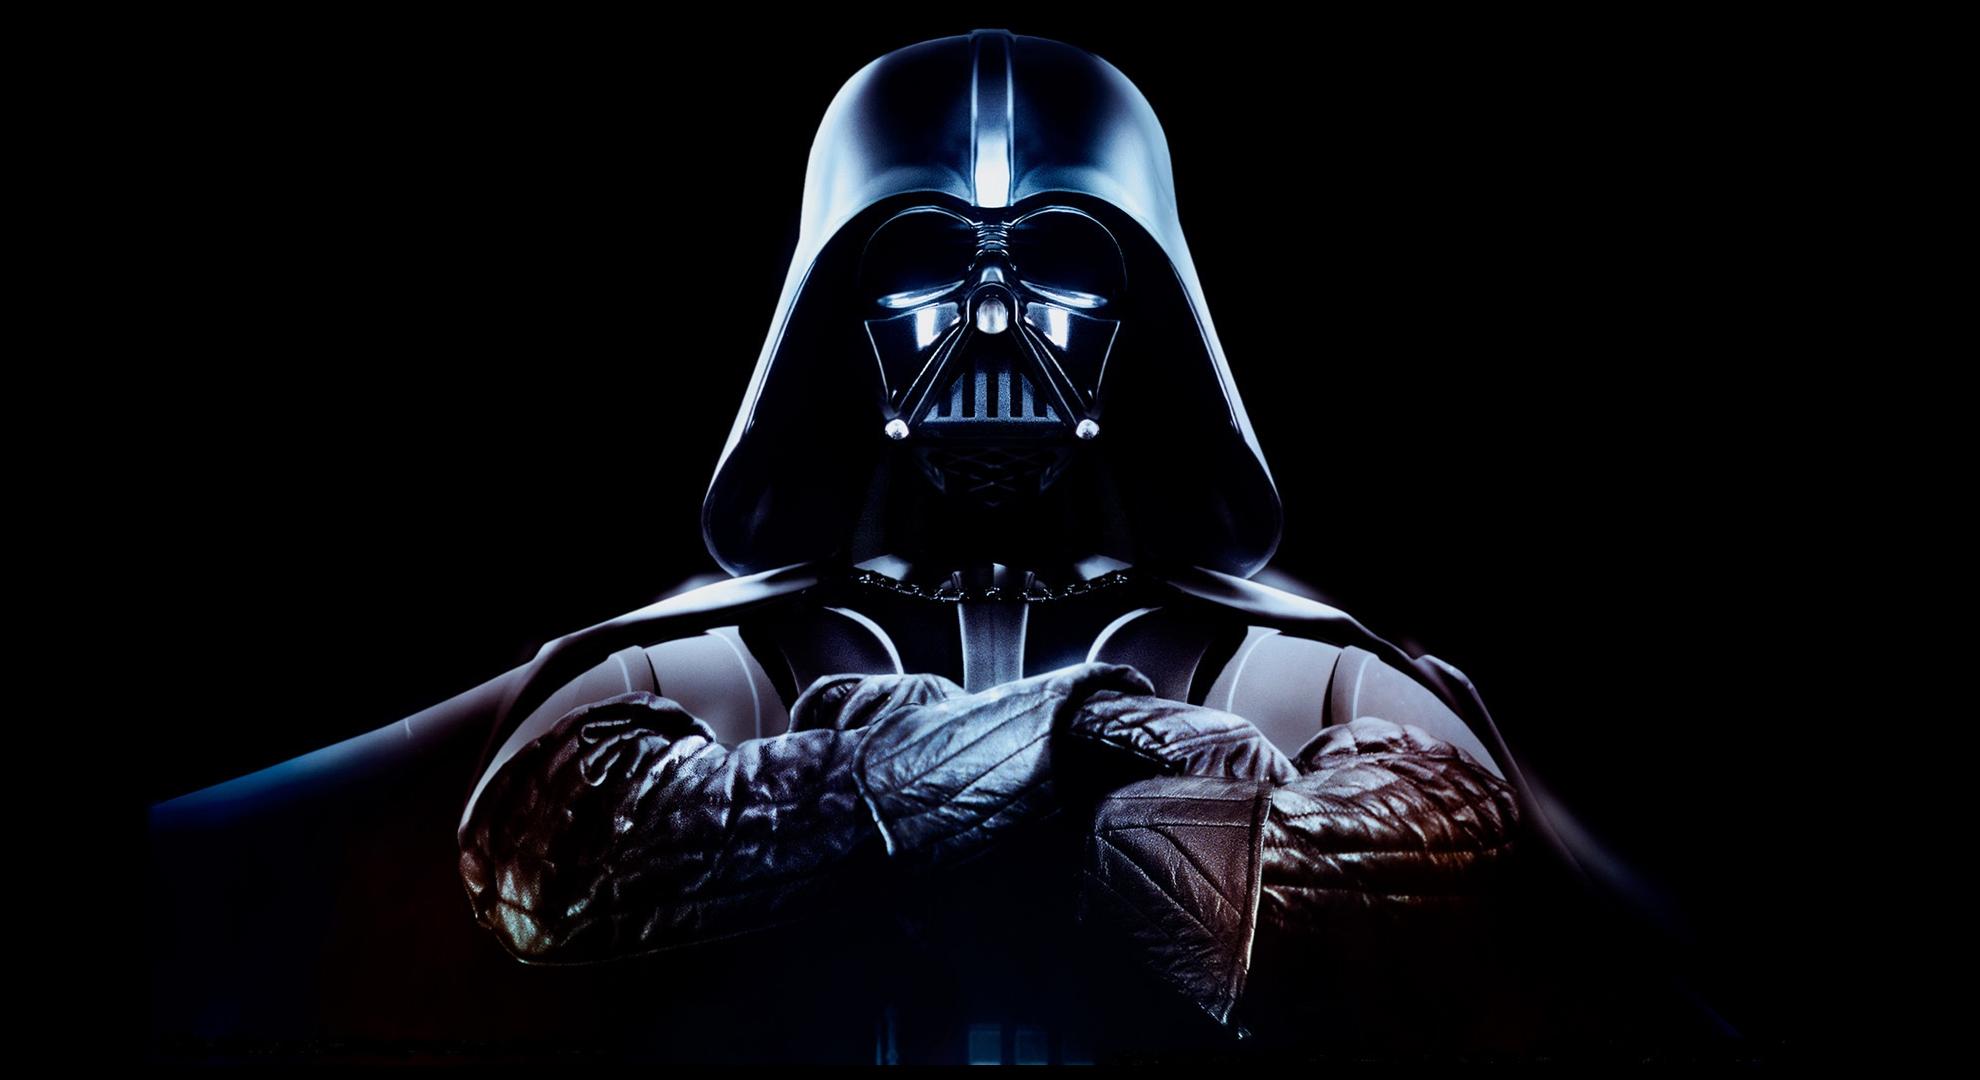 star wars darth vader 1980x1080 wallpaper Video Games Star Wars 1980x1080